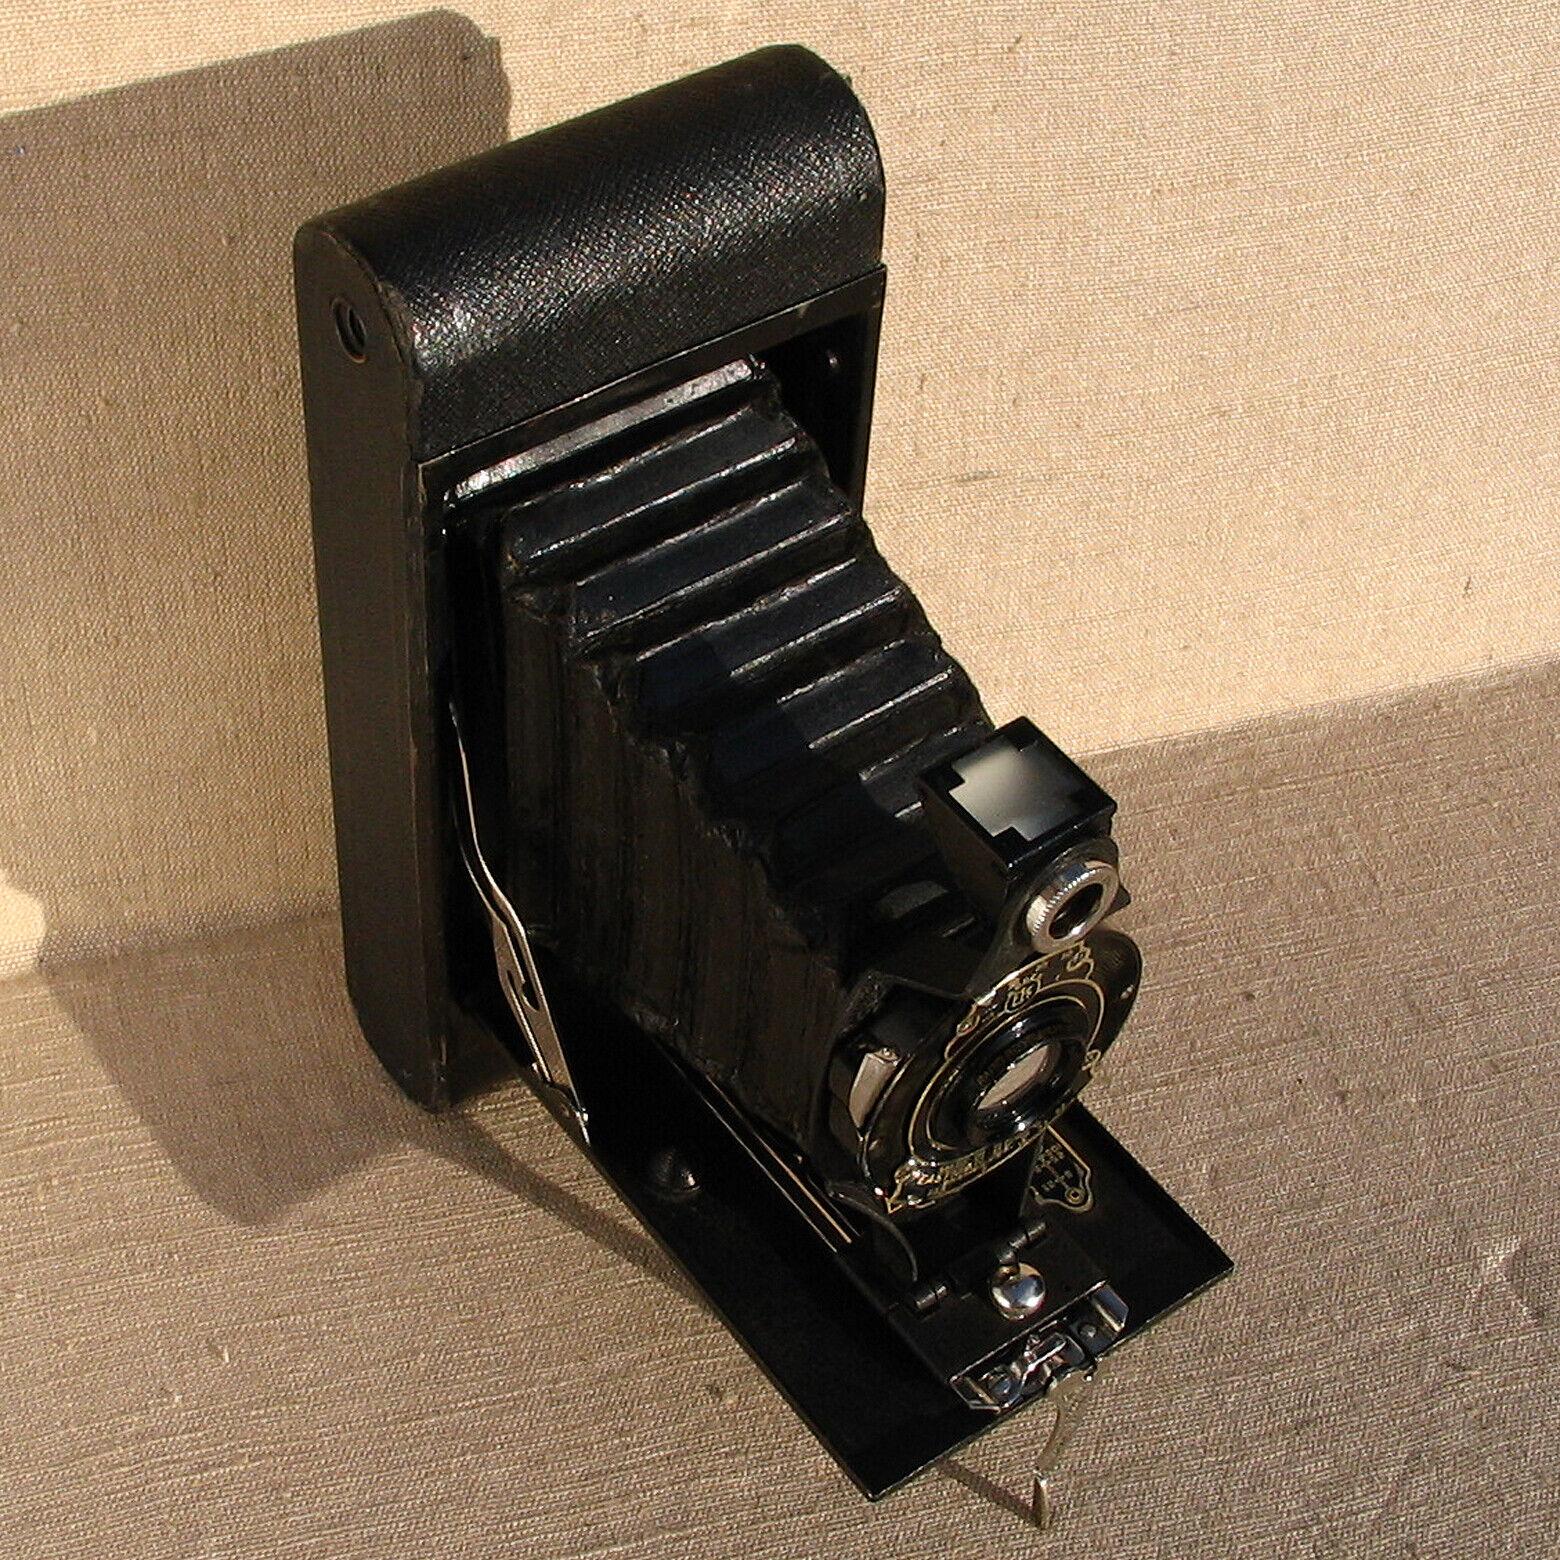 Clean Working No.2A Folding Cartridge Premo Camera - $34.00